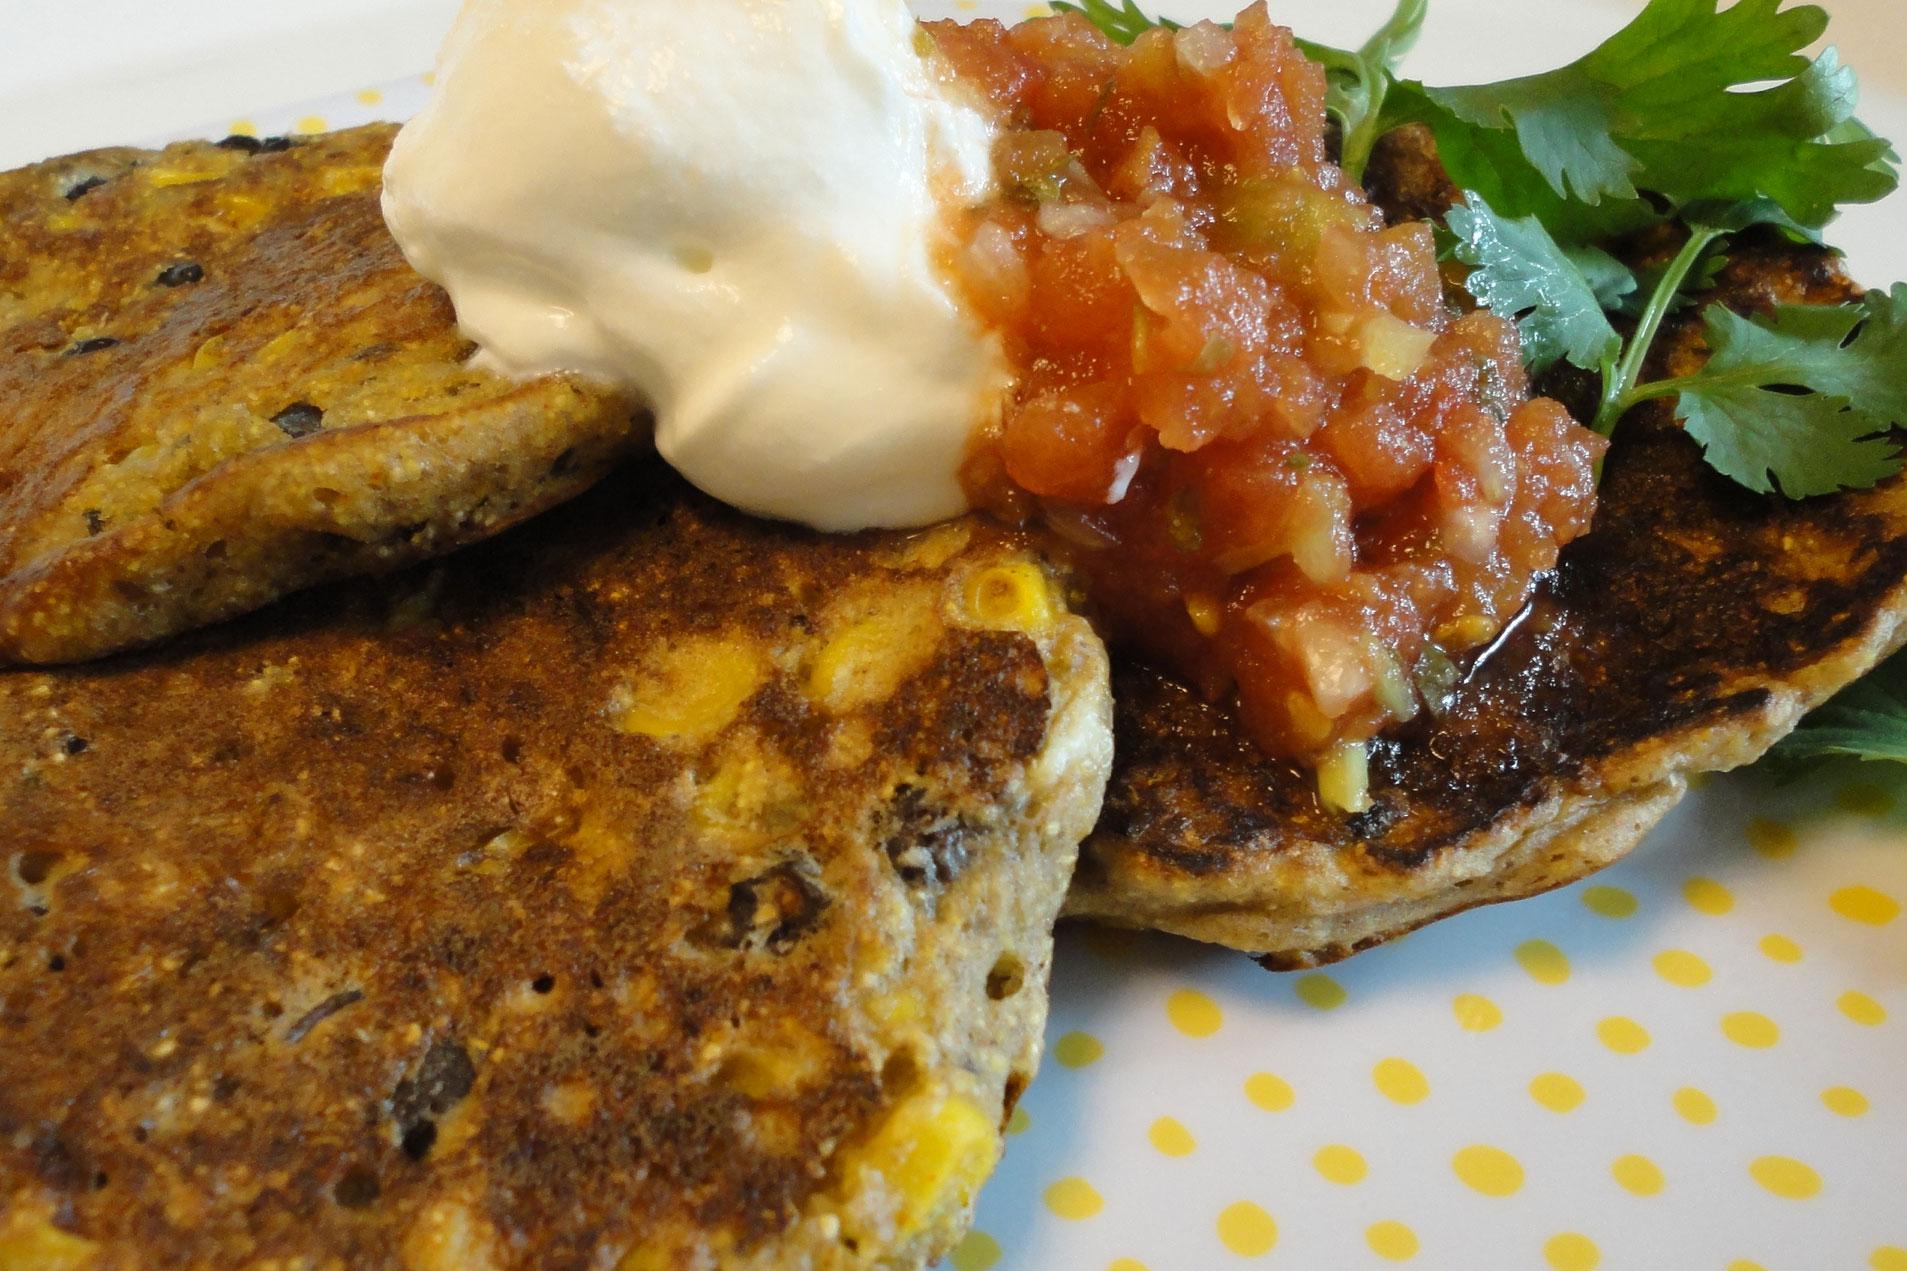 corncakes and salsa and crema